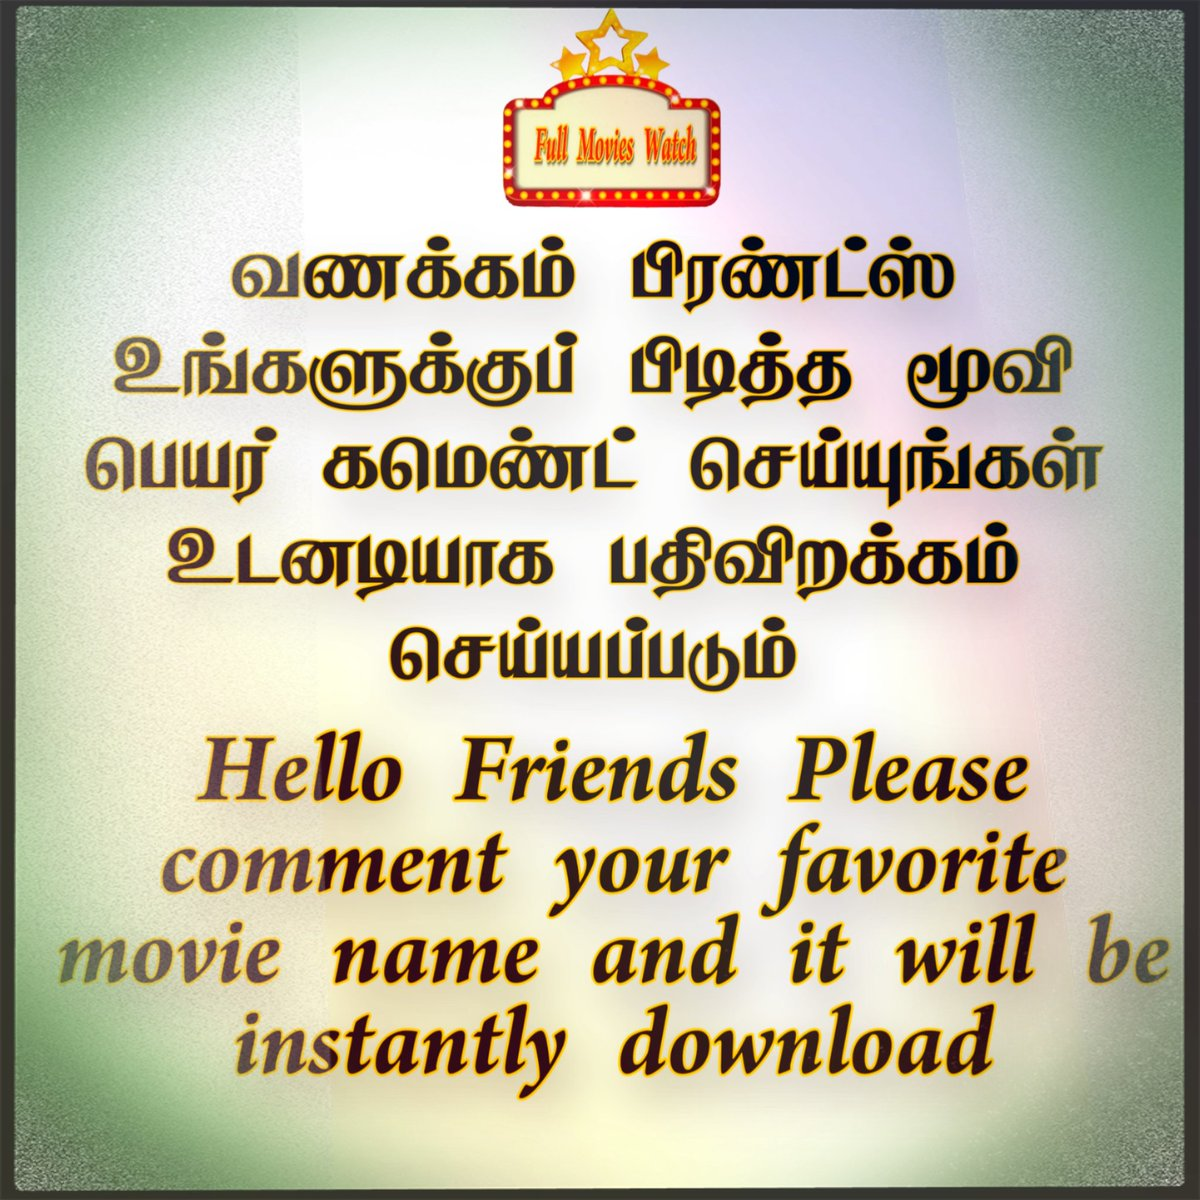 #tamilmovie #Tamil #kollywoodCinema @tamilmovies13pic.twitter.com/Lke8nrrzjx